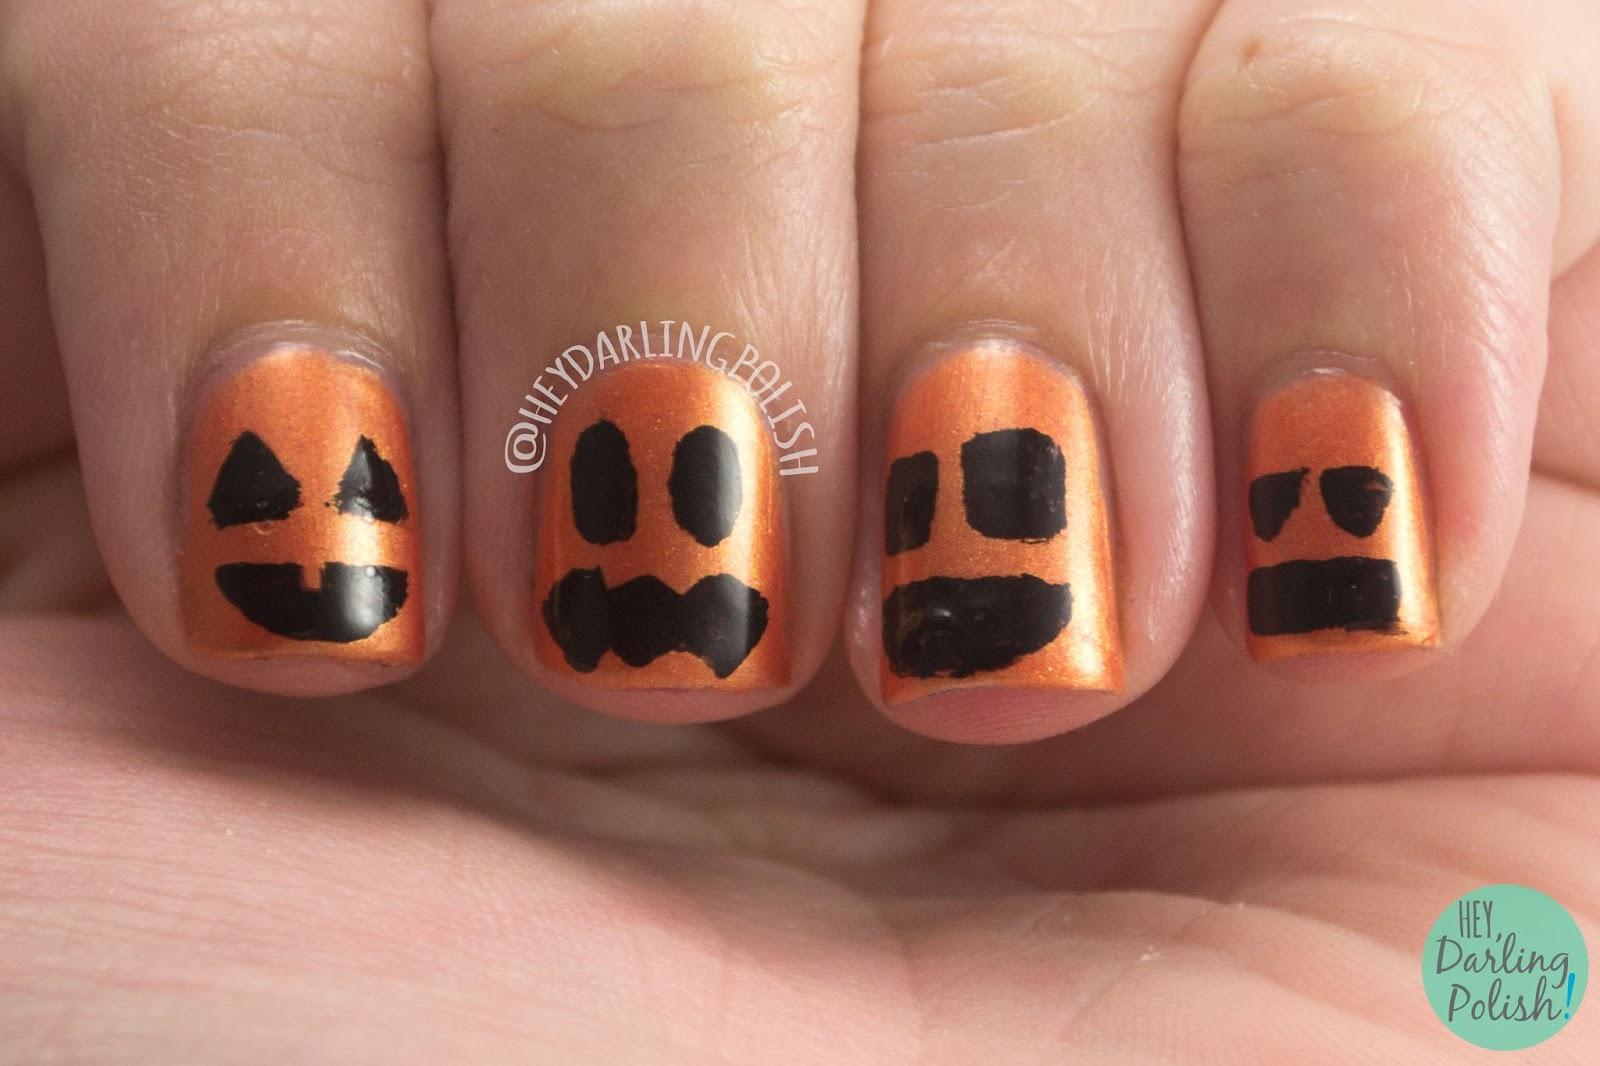 nails, nail art, nail polish, indie polish, indie, liquid kandi, october sweet treat box, halloween, orange, pumpkins, autumn leaves, shimmer